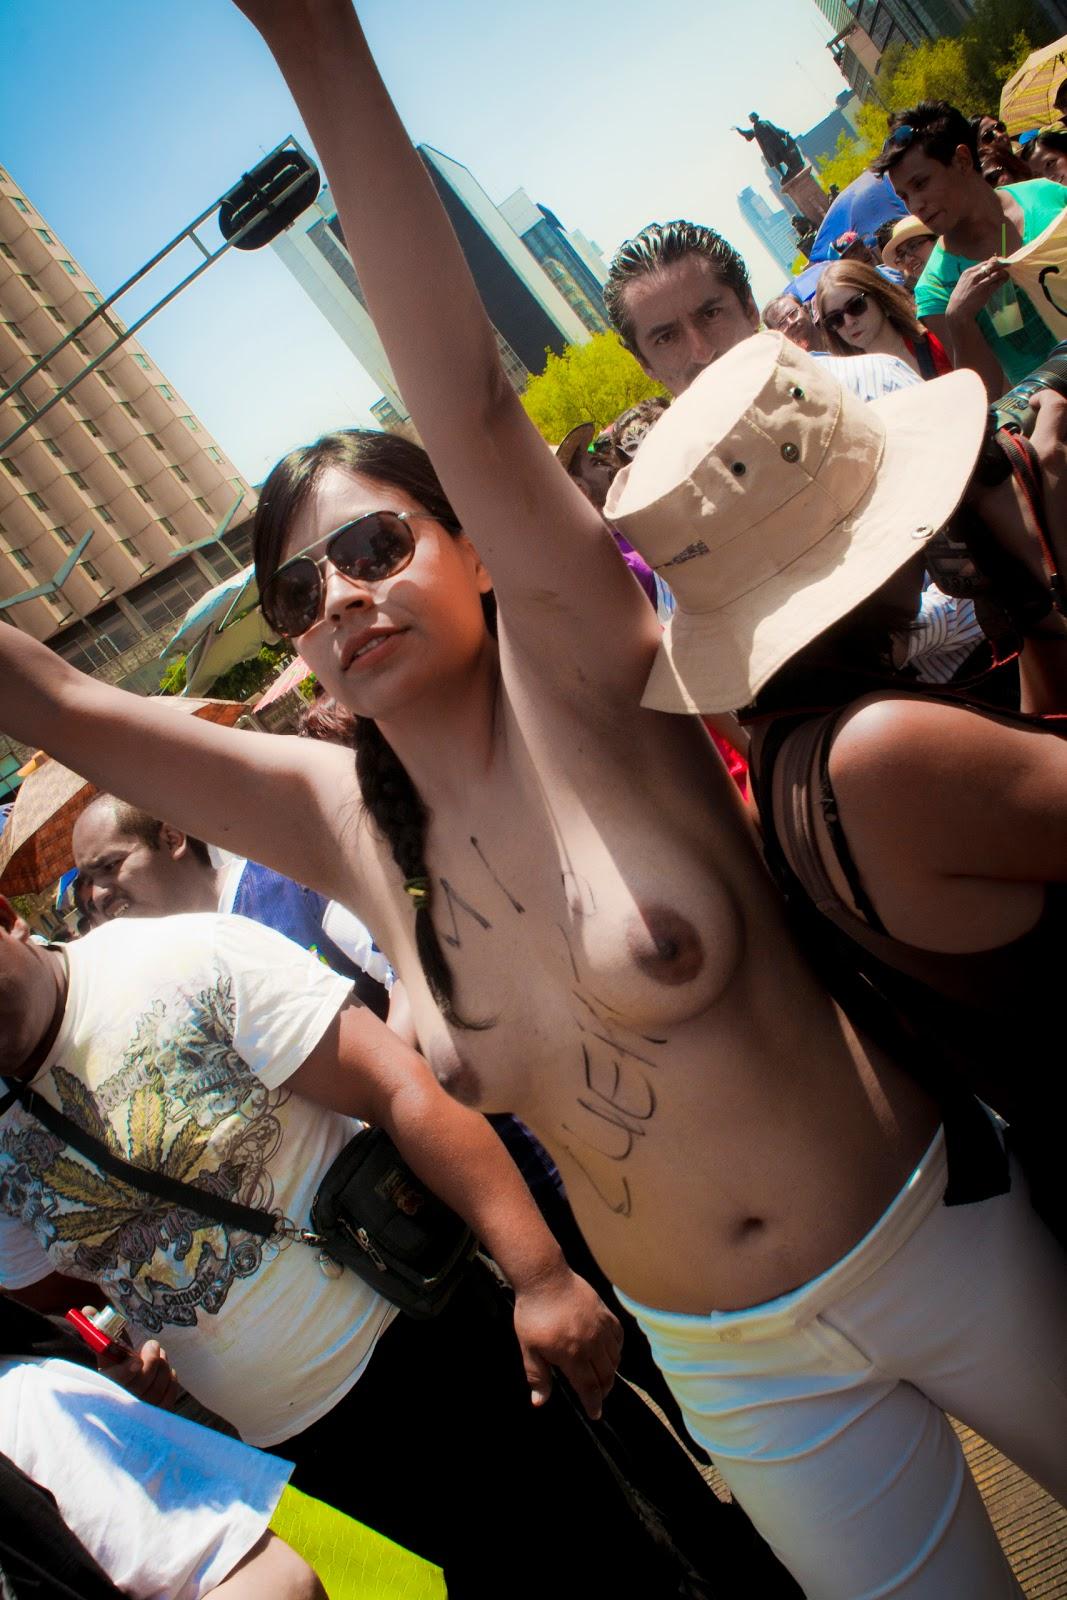 prostitutas en guadalajara numero de prostitutas en españa